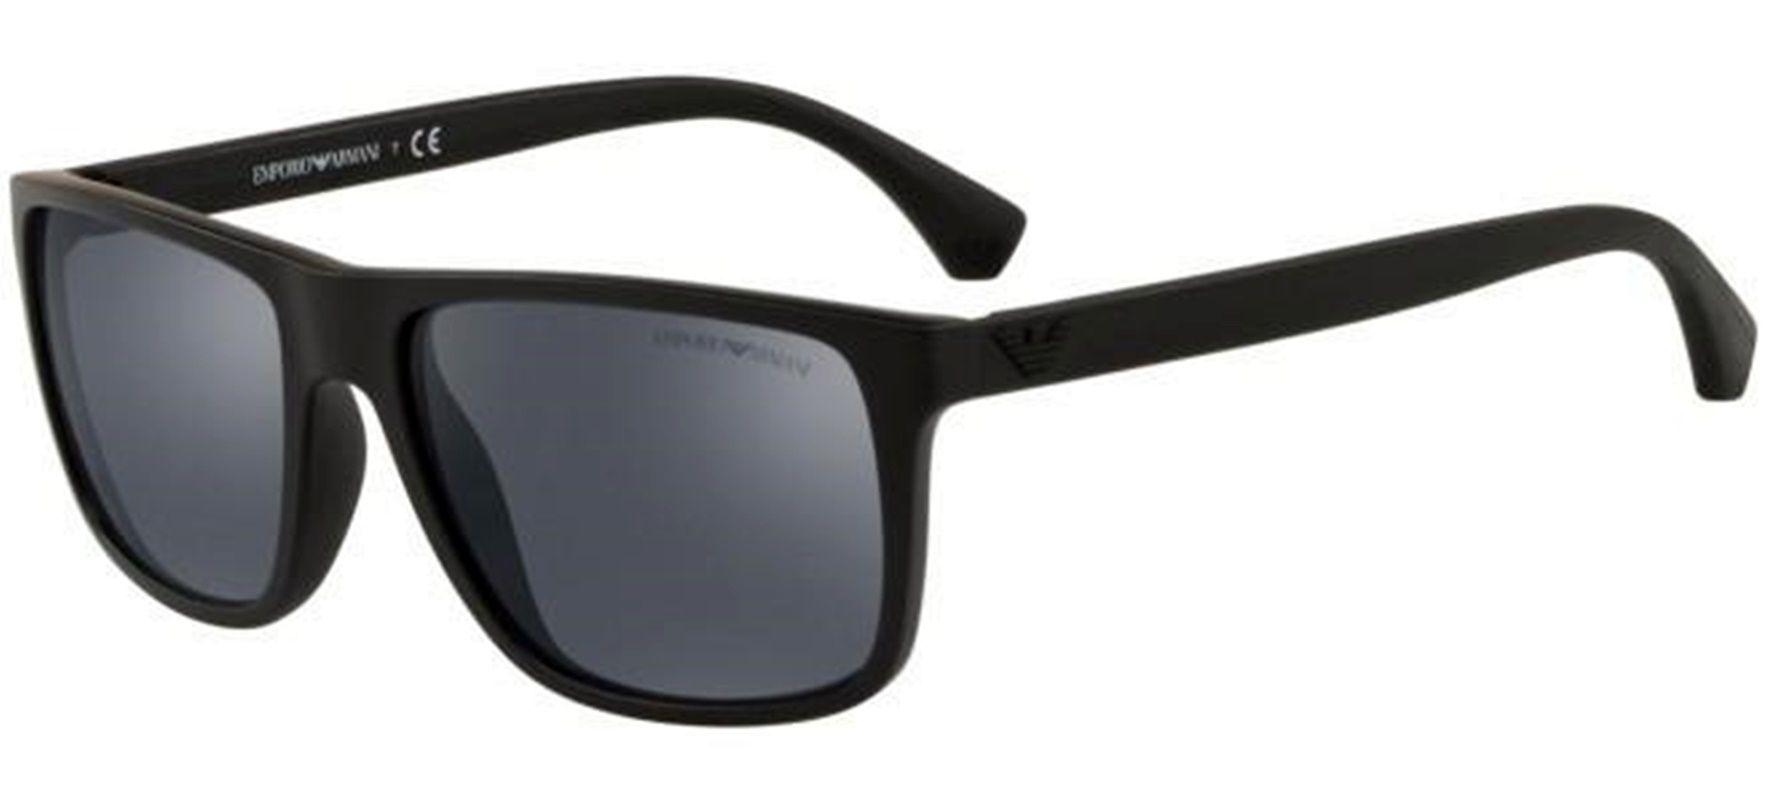 caeb24ac7 Óculos de Sol Emporio Armani EA4033 5649/6Q - Omega Ótica e Relojoaria